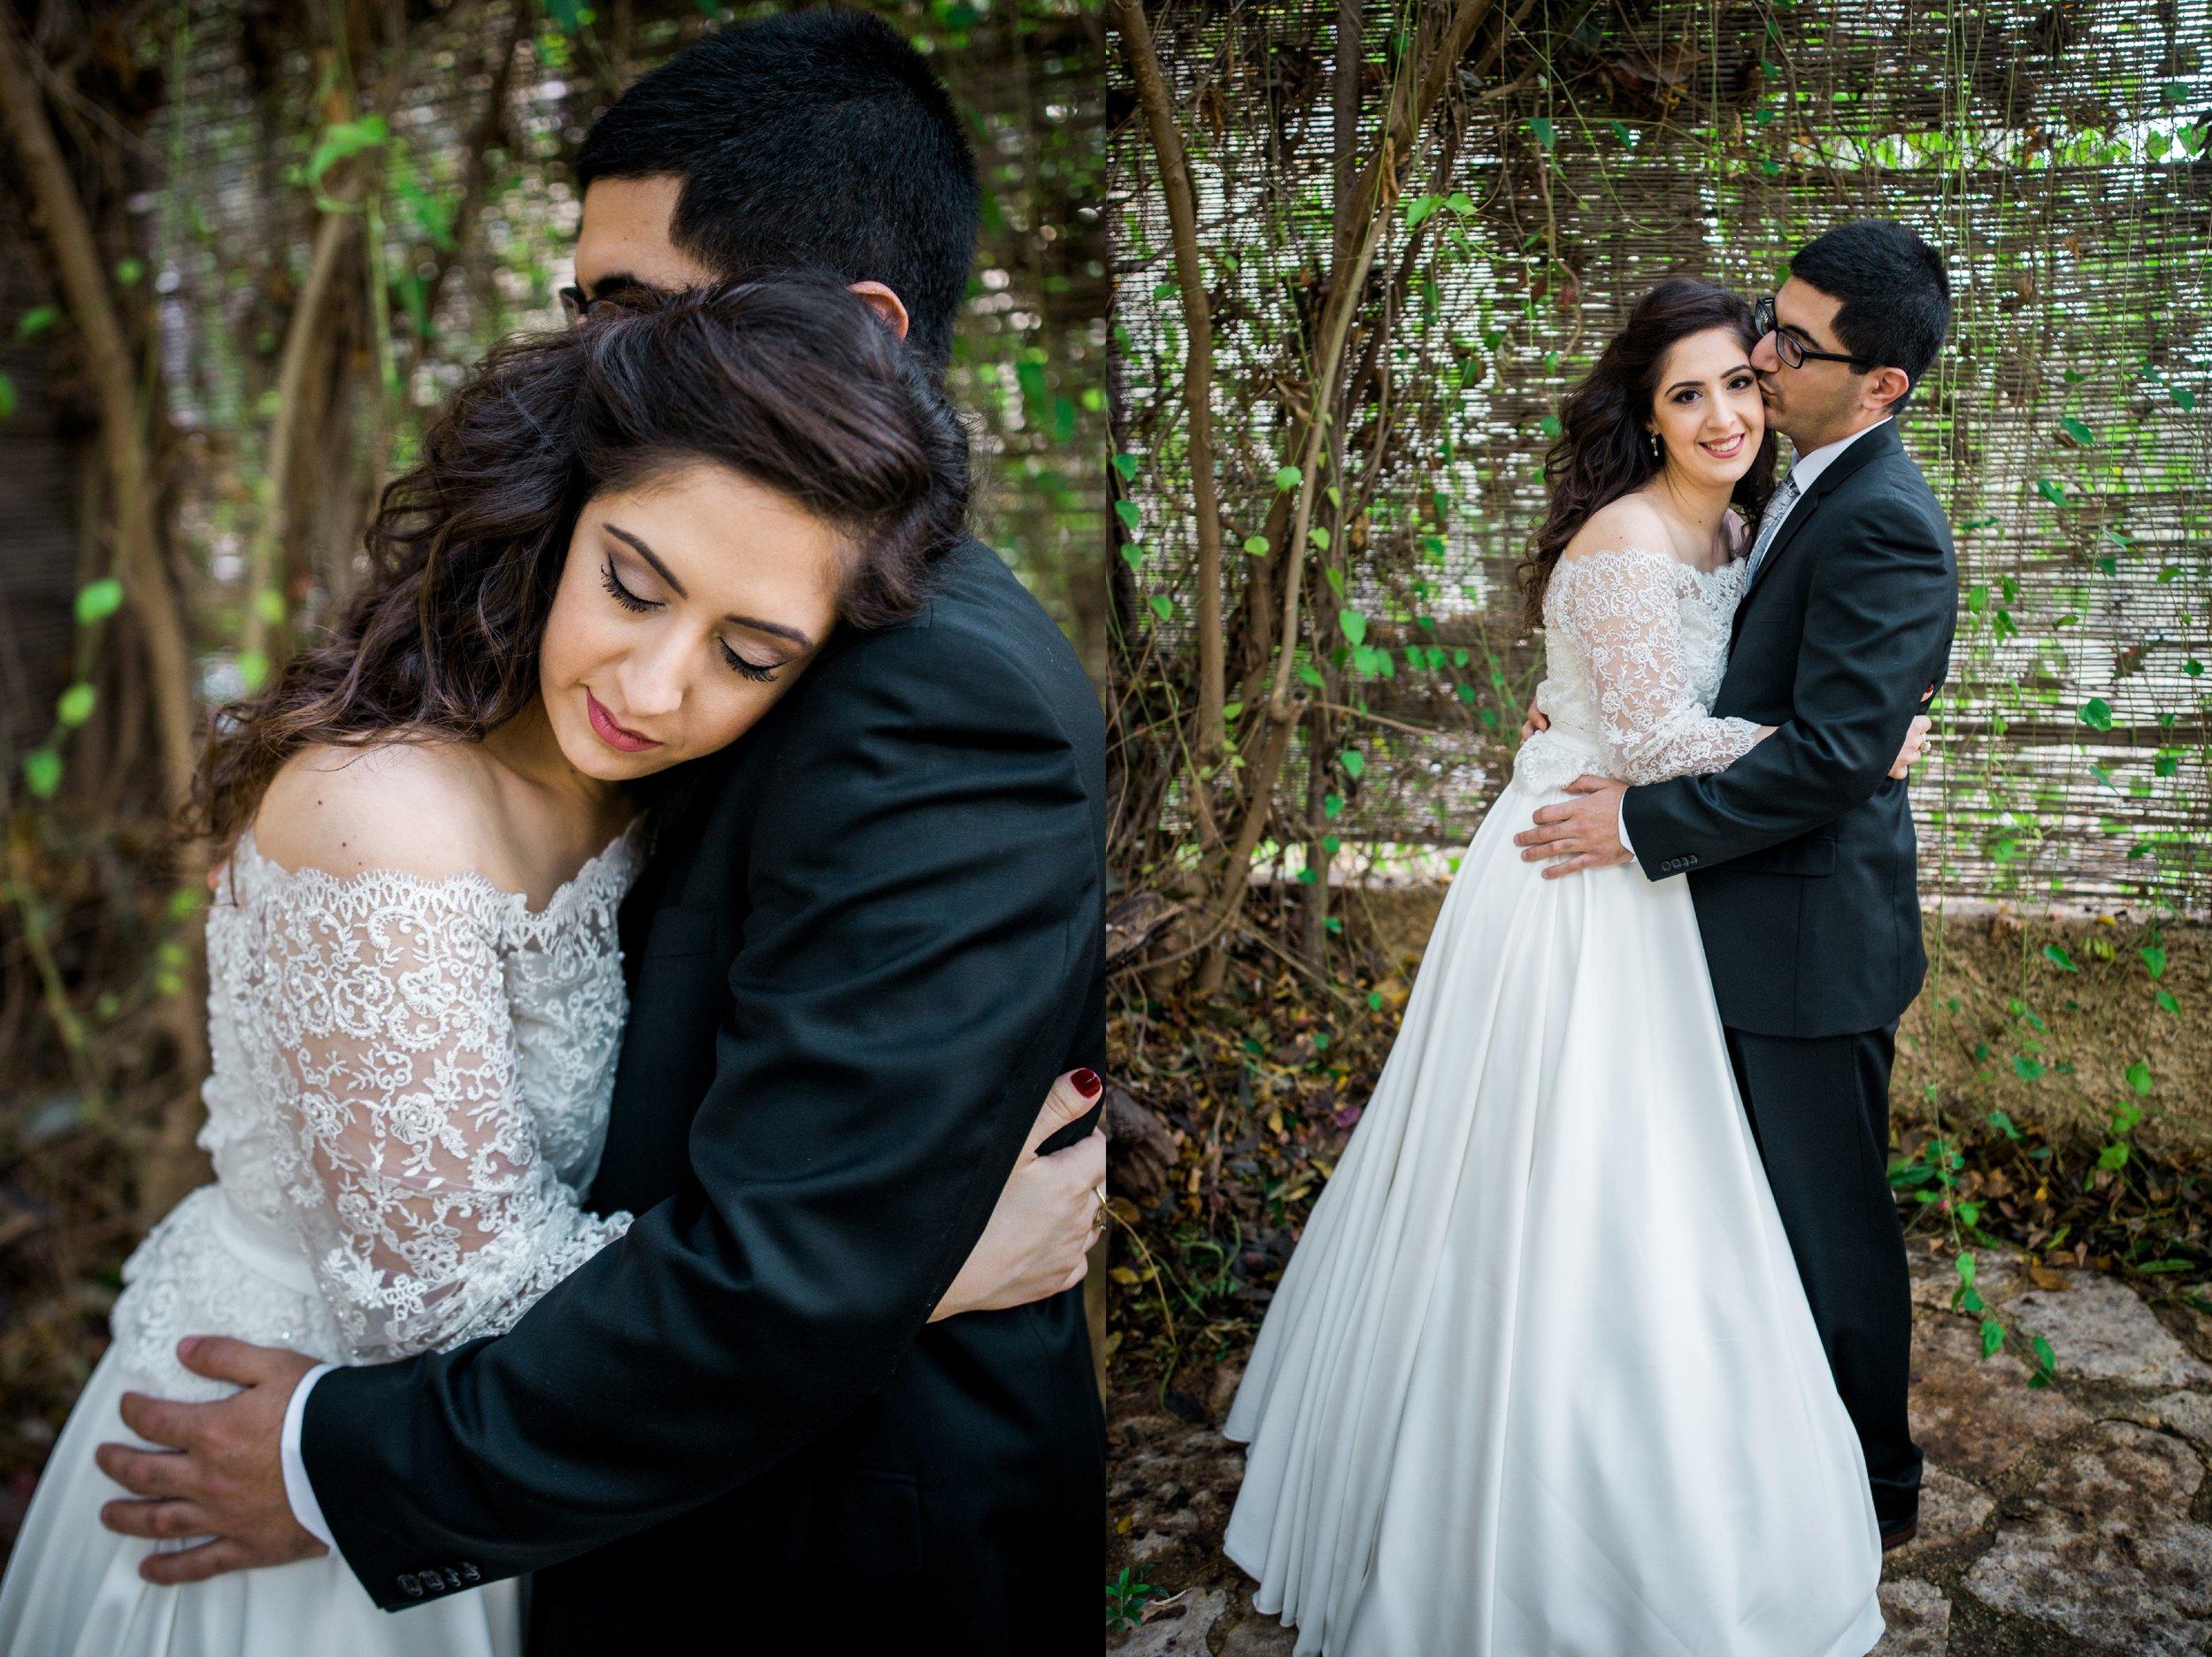 israel-garden-wedding-portraits-session-kate-giryes-photography--22_WEB.jpg